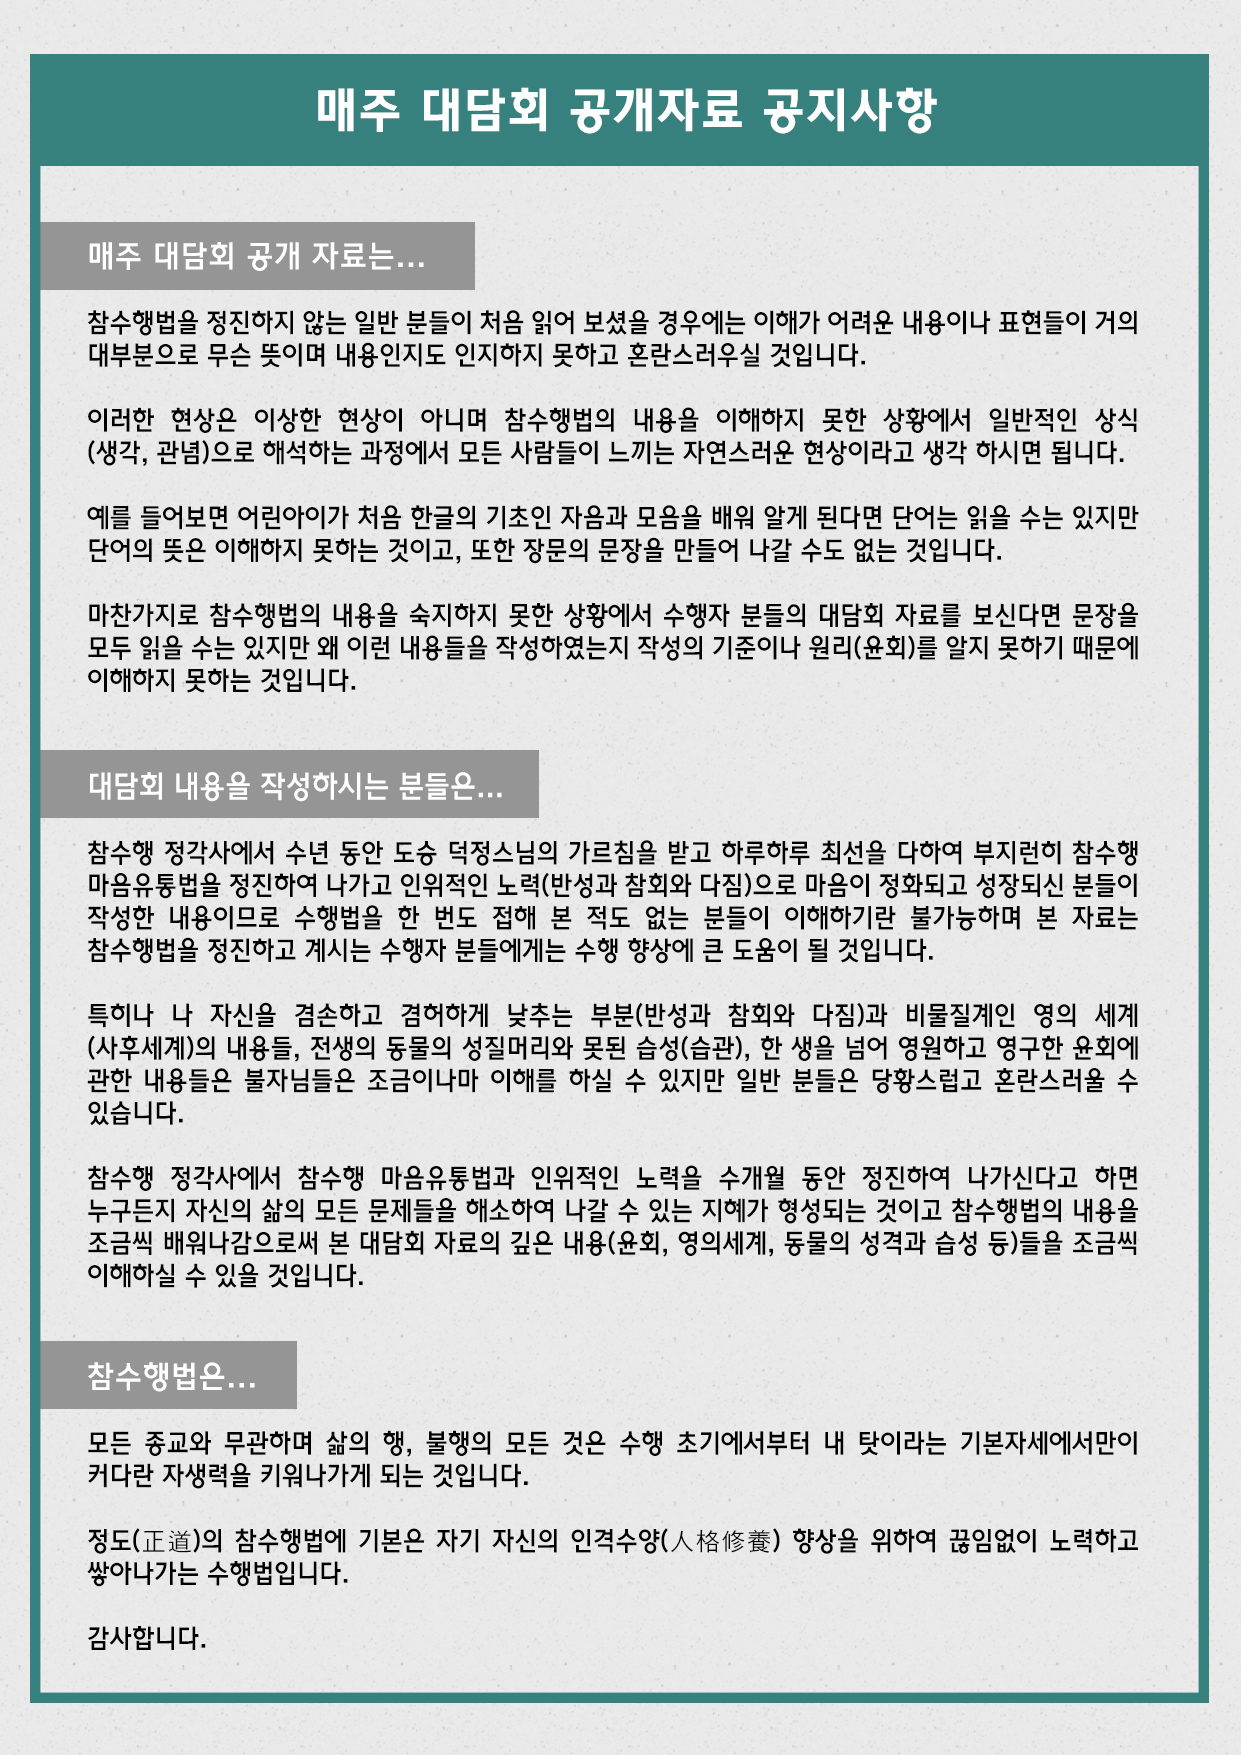 notice 2016.12.21.jpg